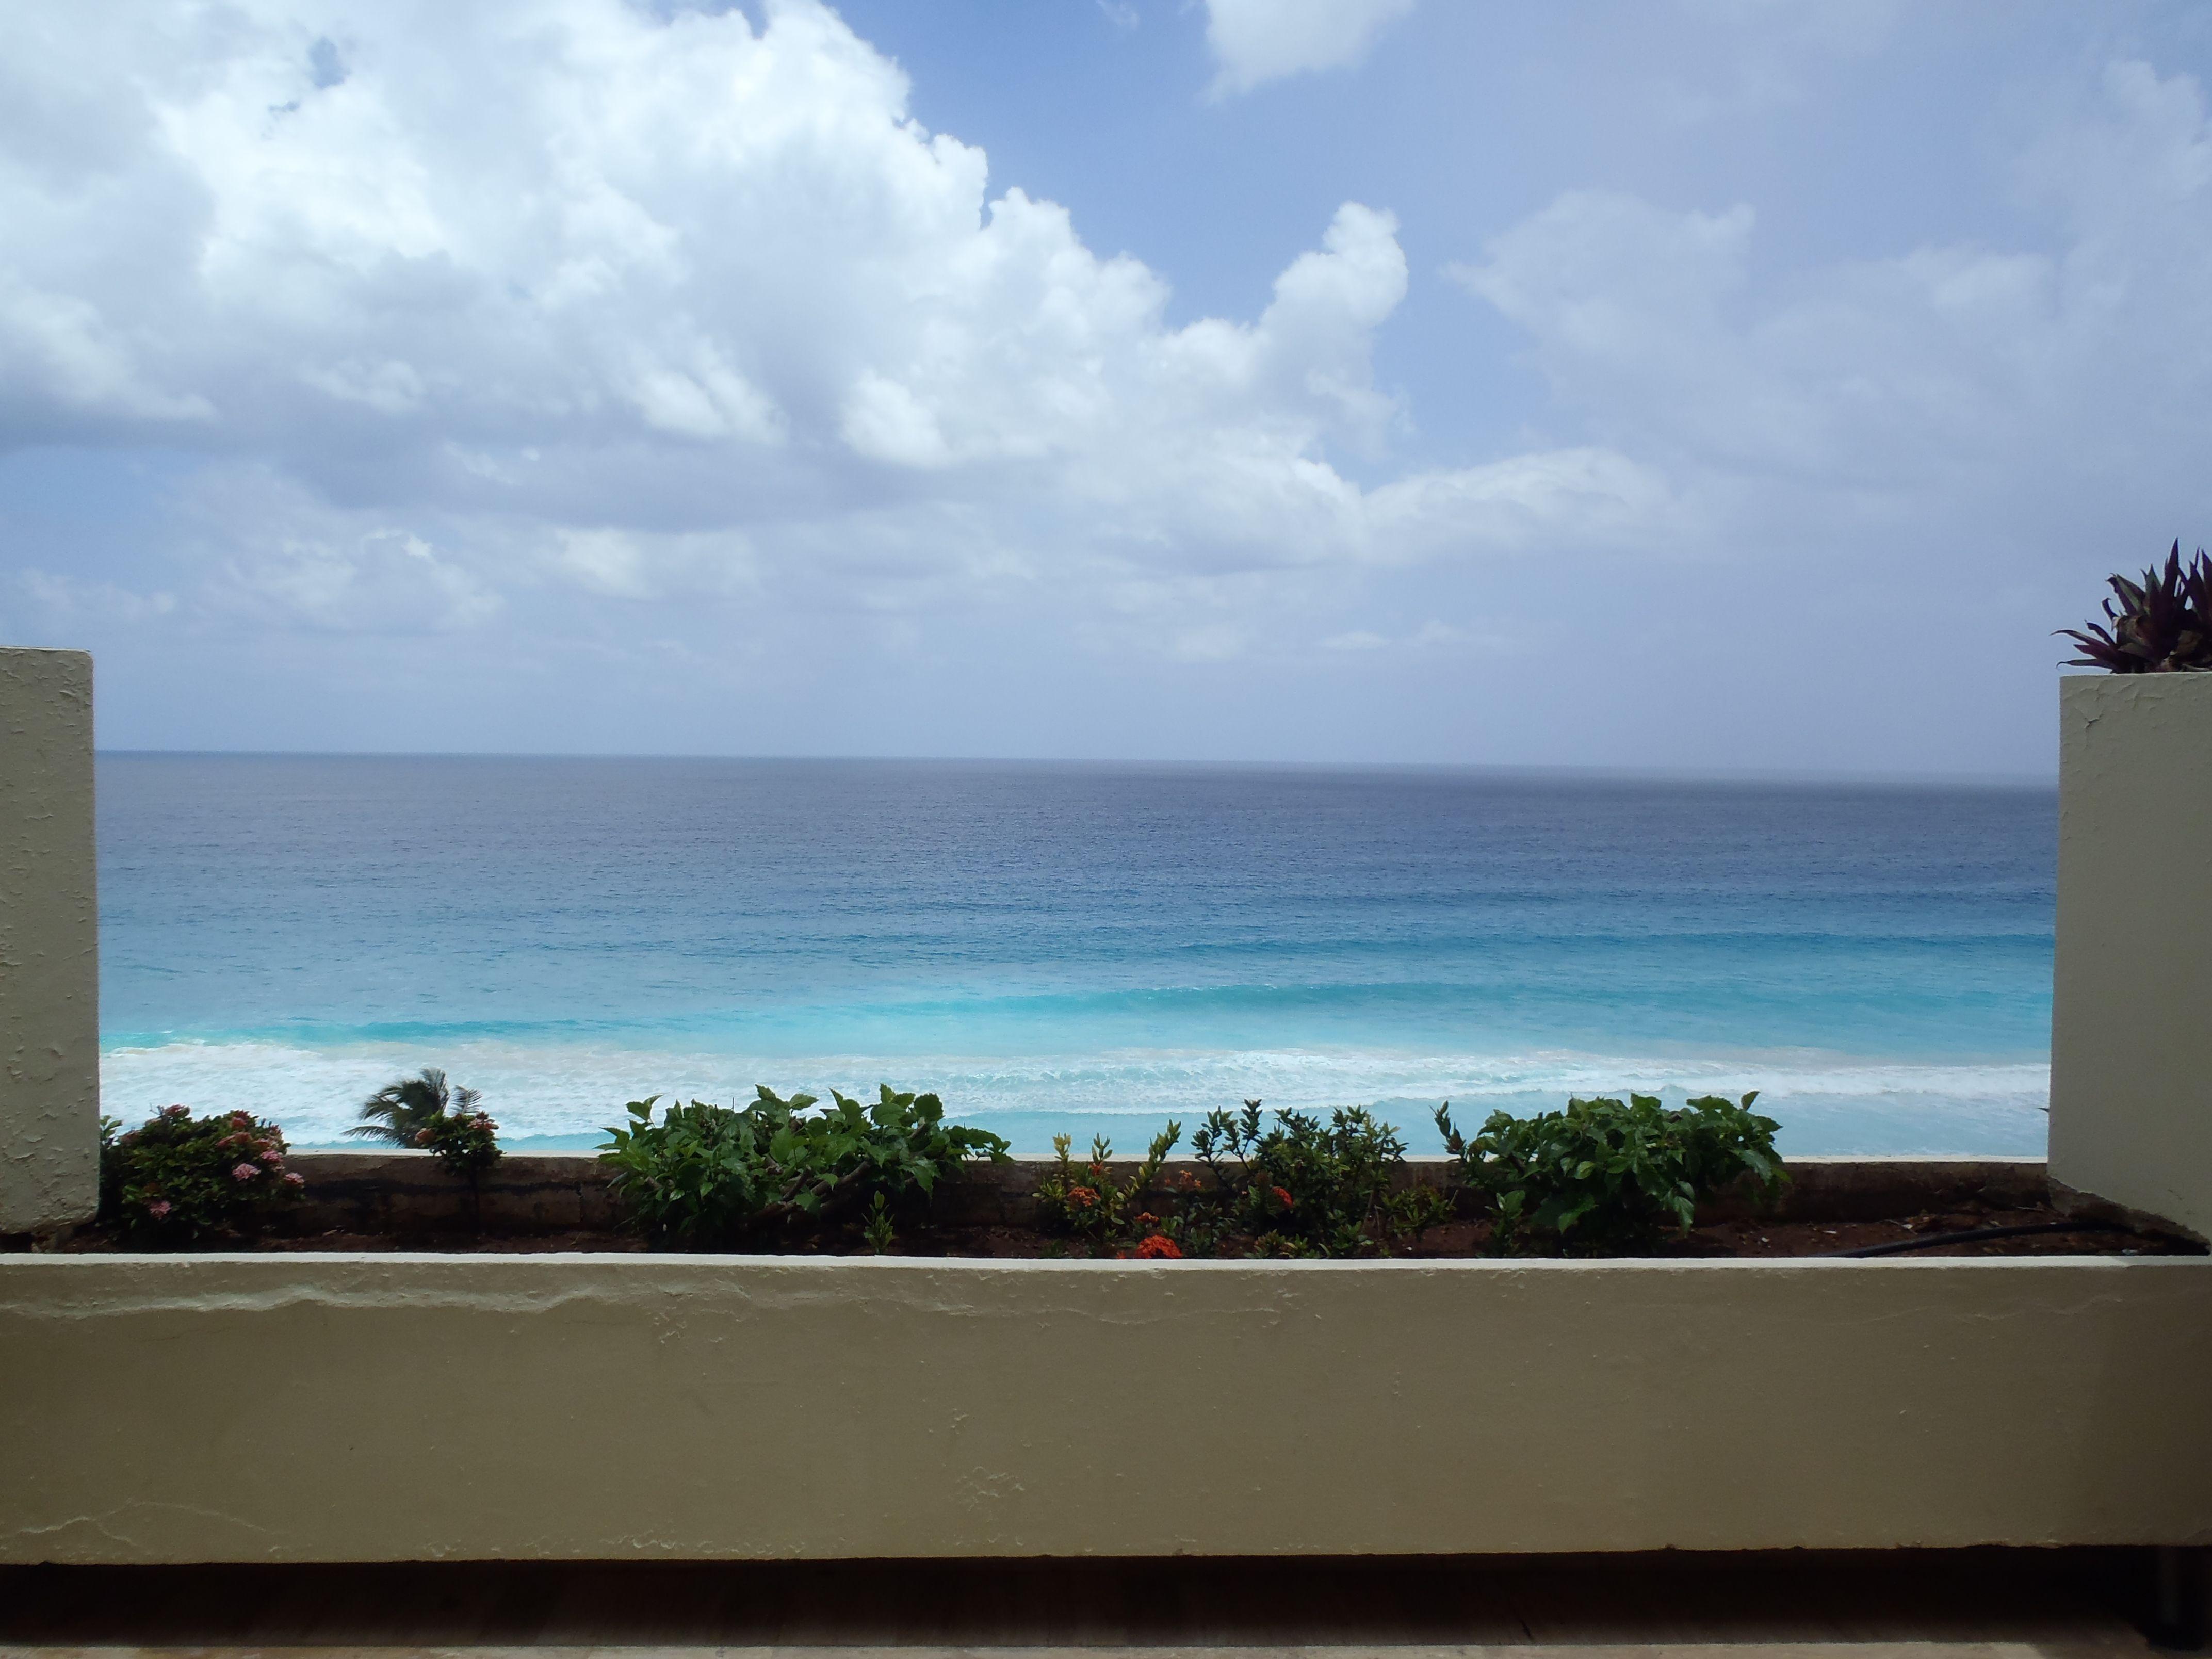 Cancun vs. the Mayan Riviera